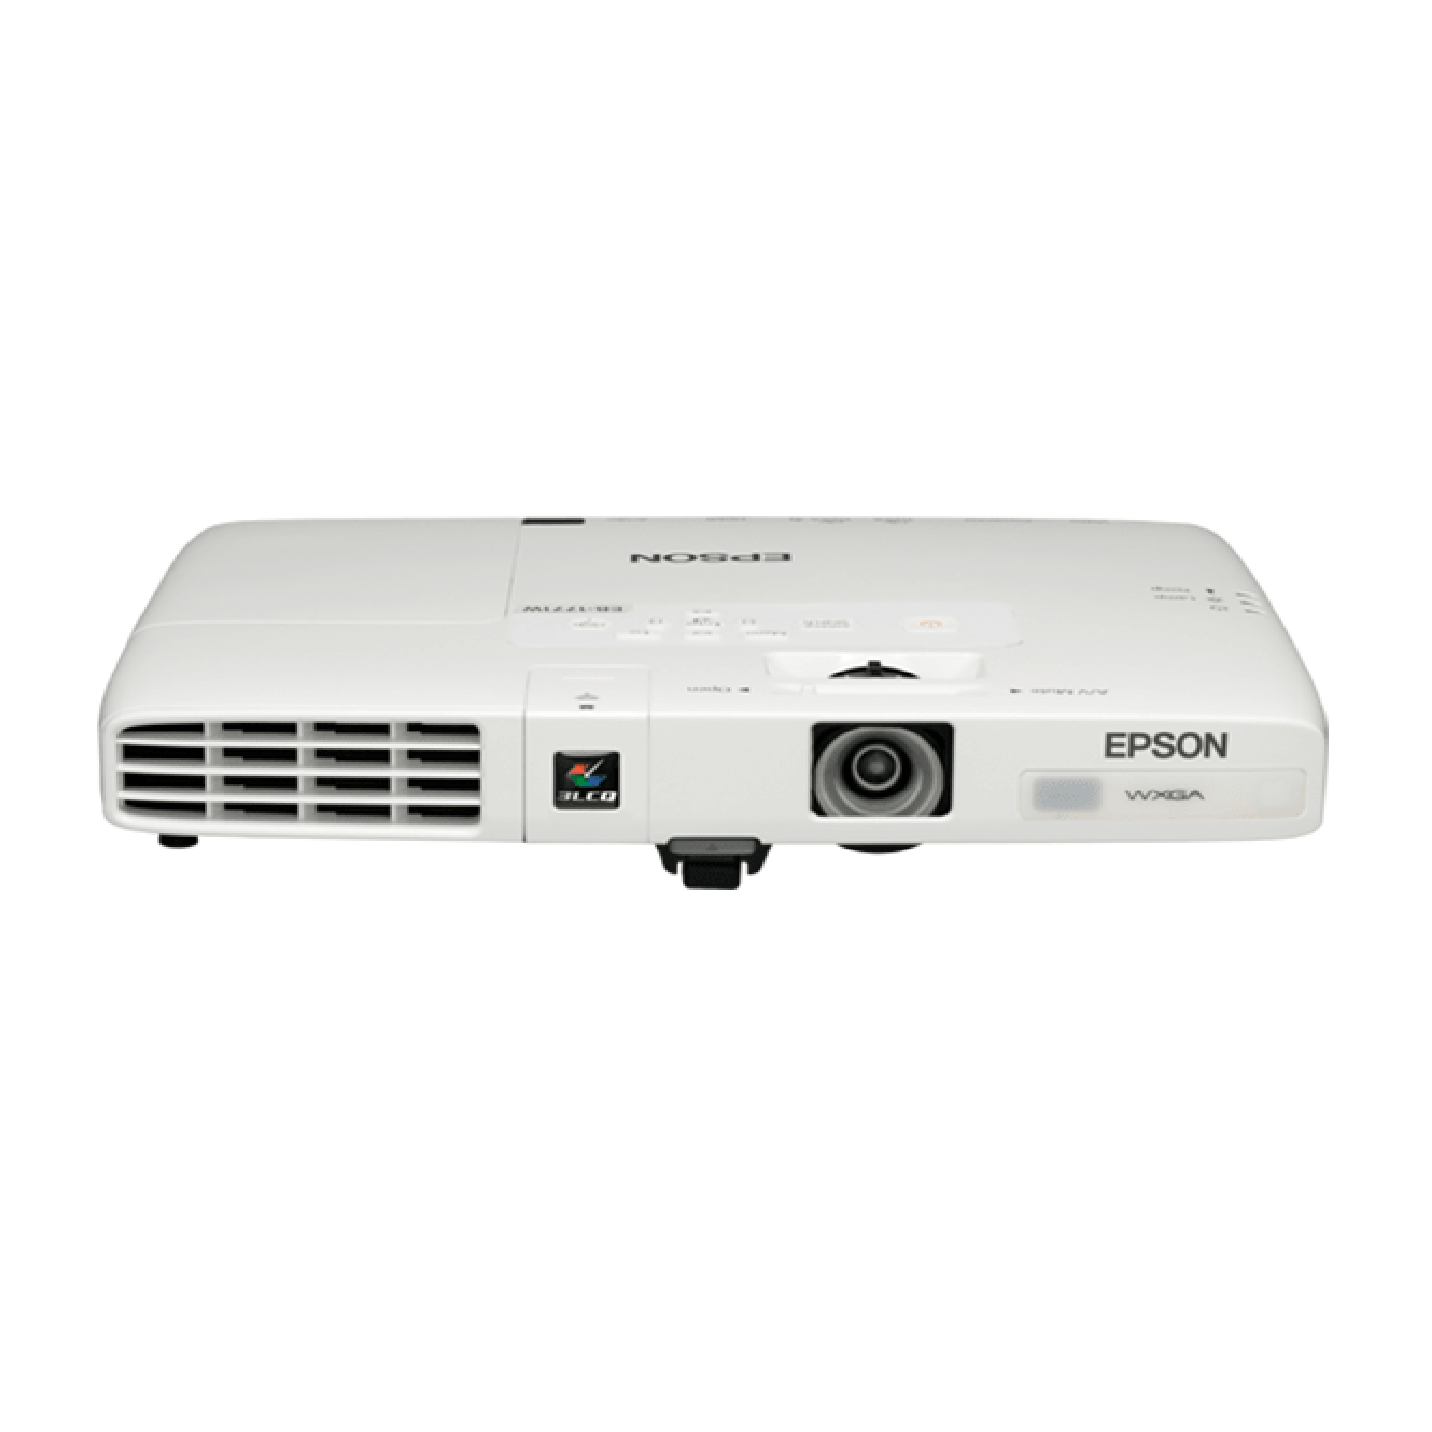 Epson Ultra Portable Projector EB-1751 XGA